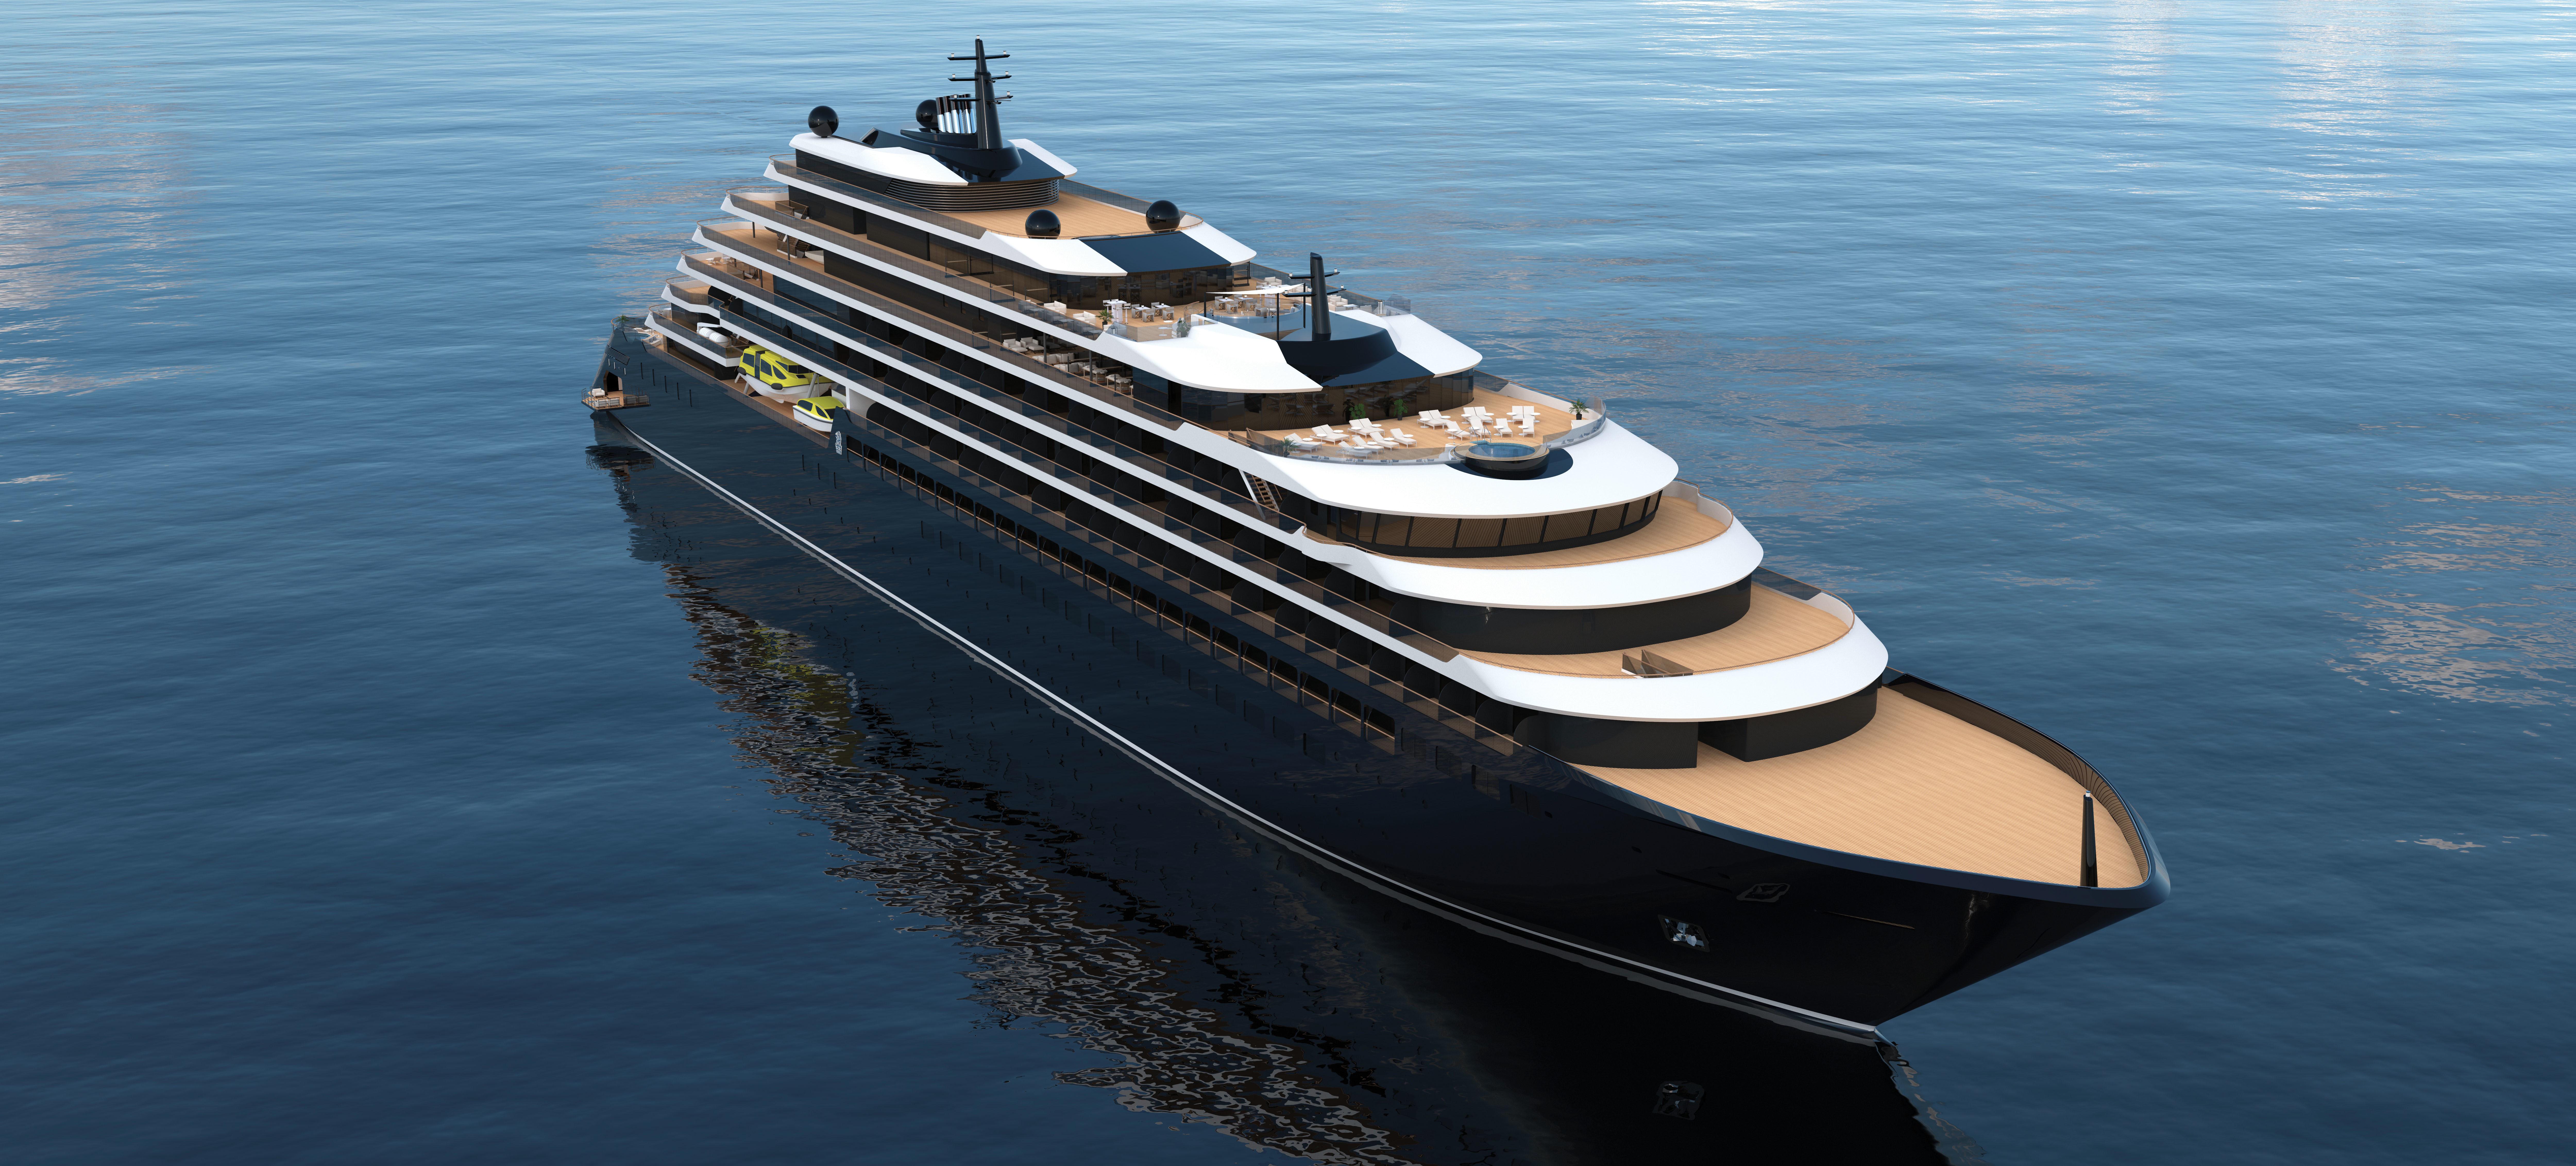 cruise marriott meetings sea yacht